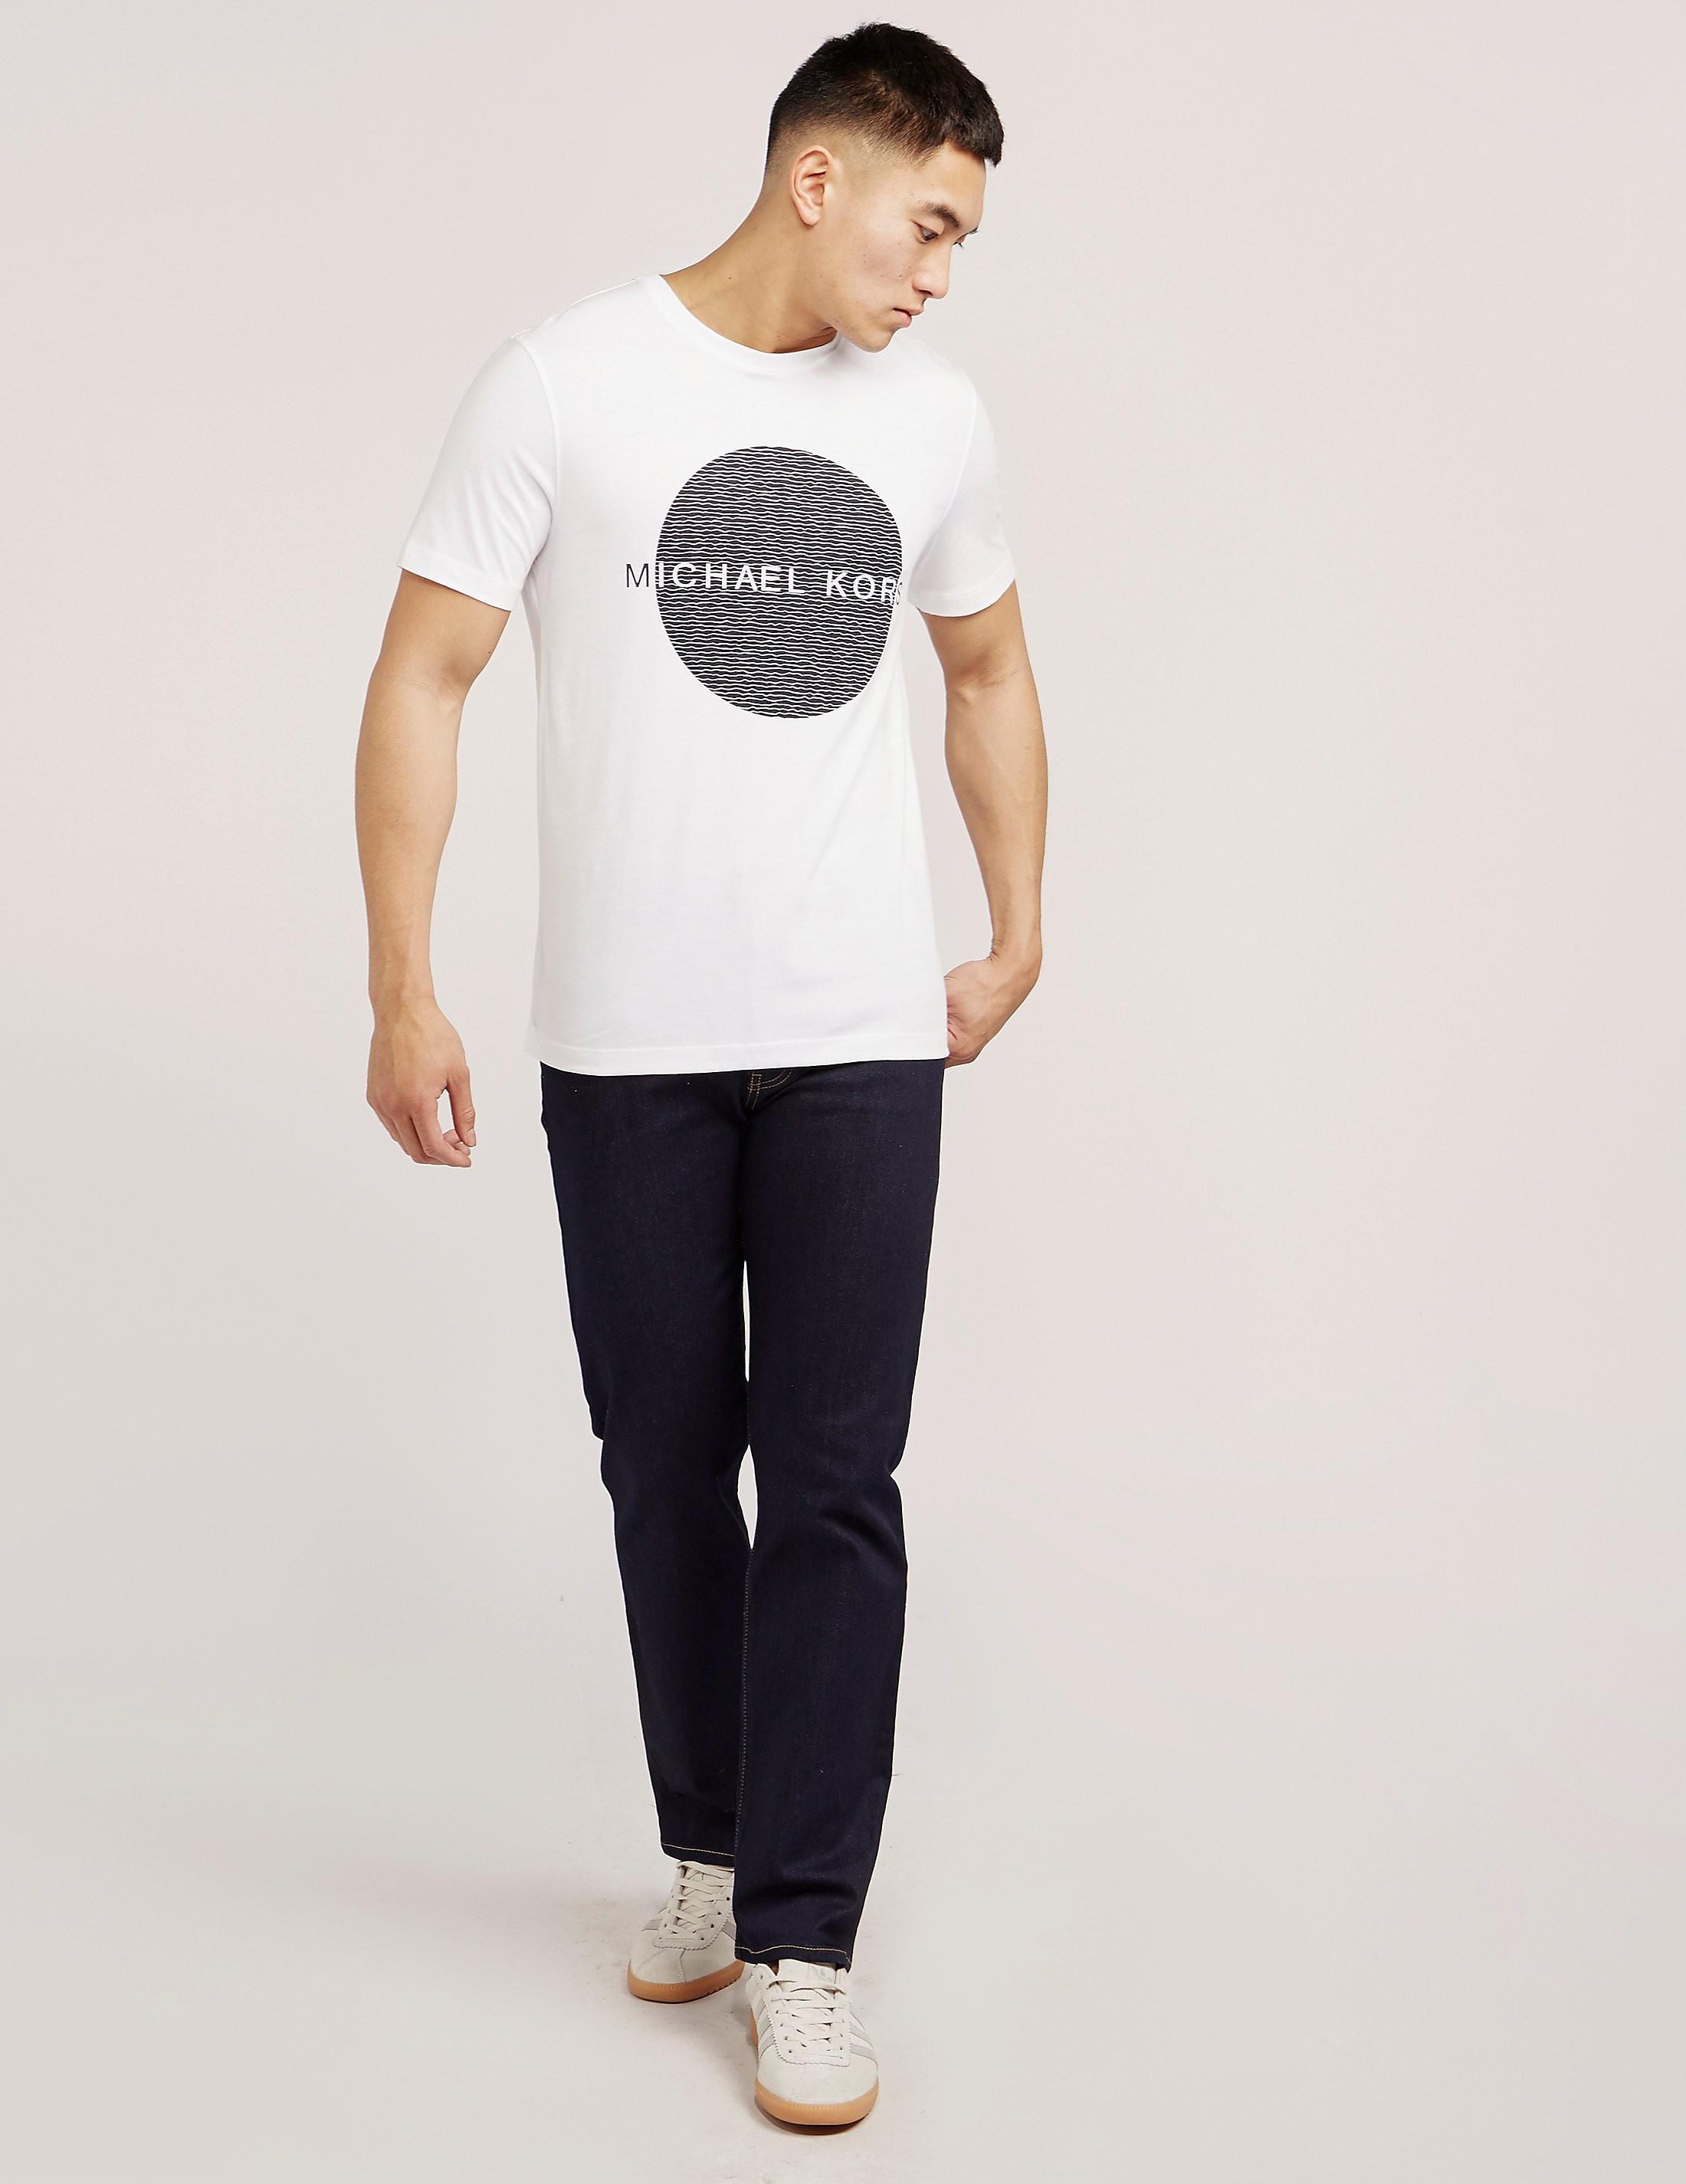 Michael Kors Wave Short Sleeve T-Shirt